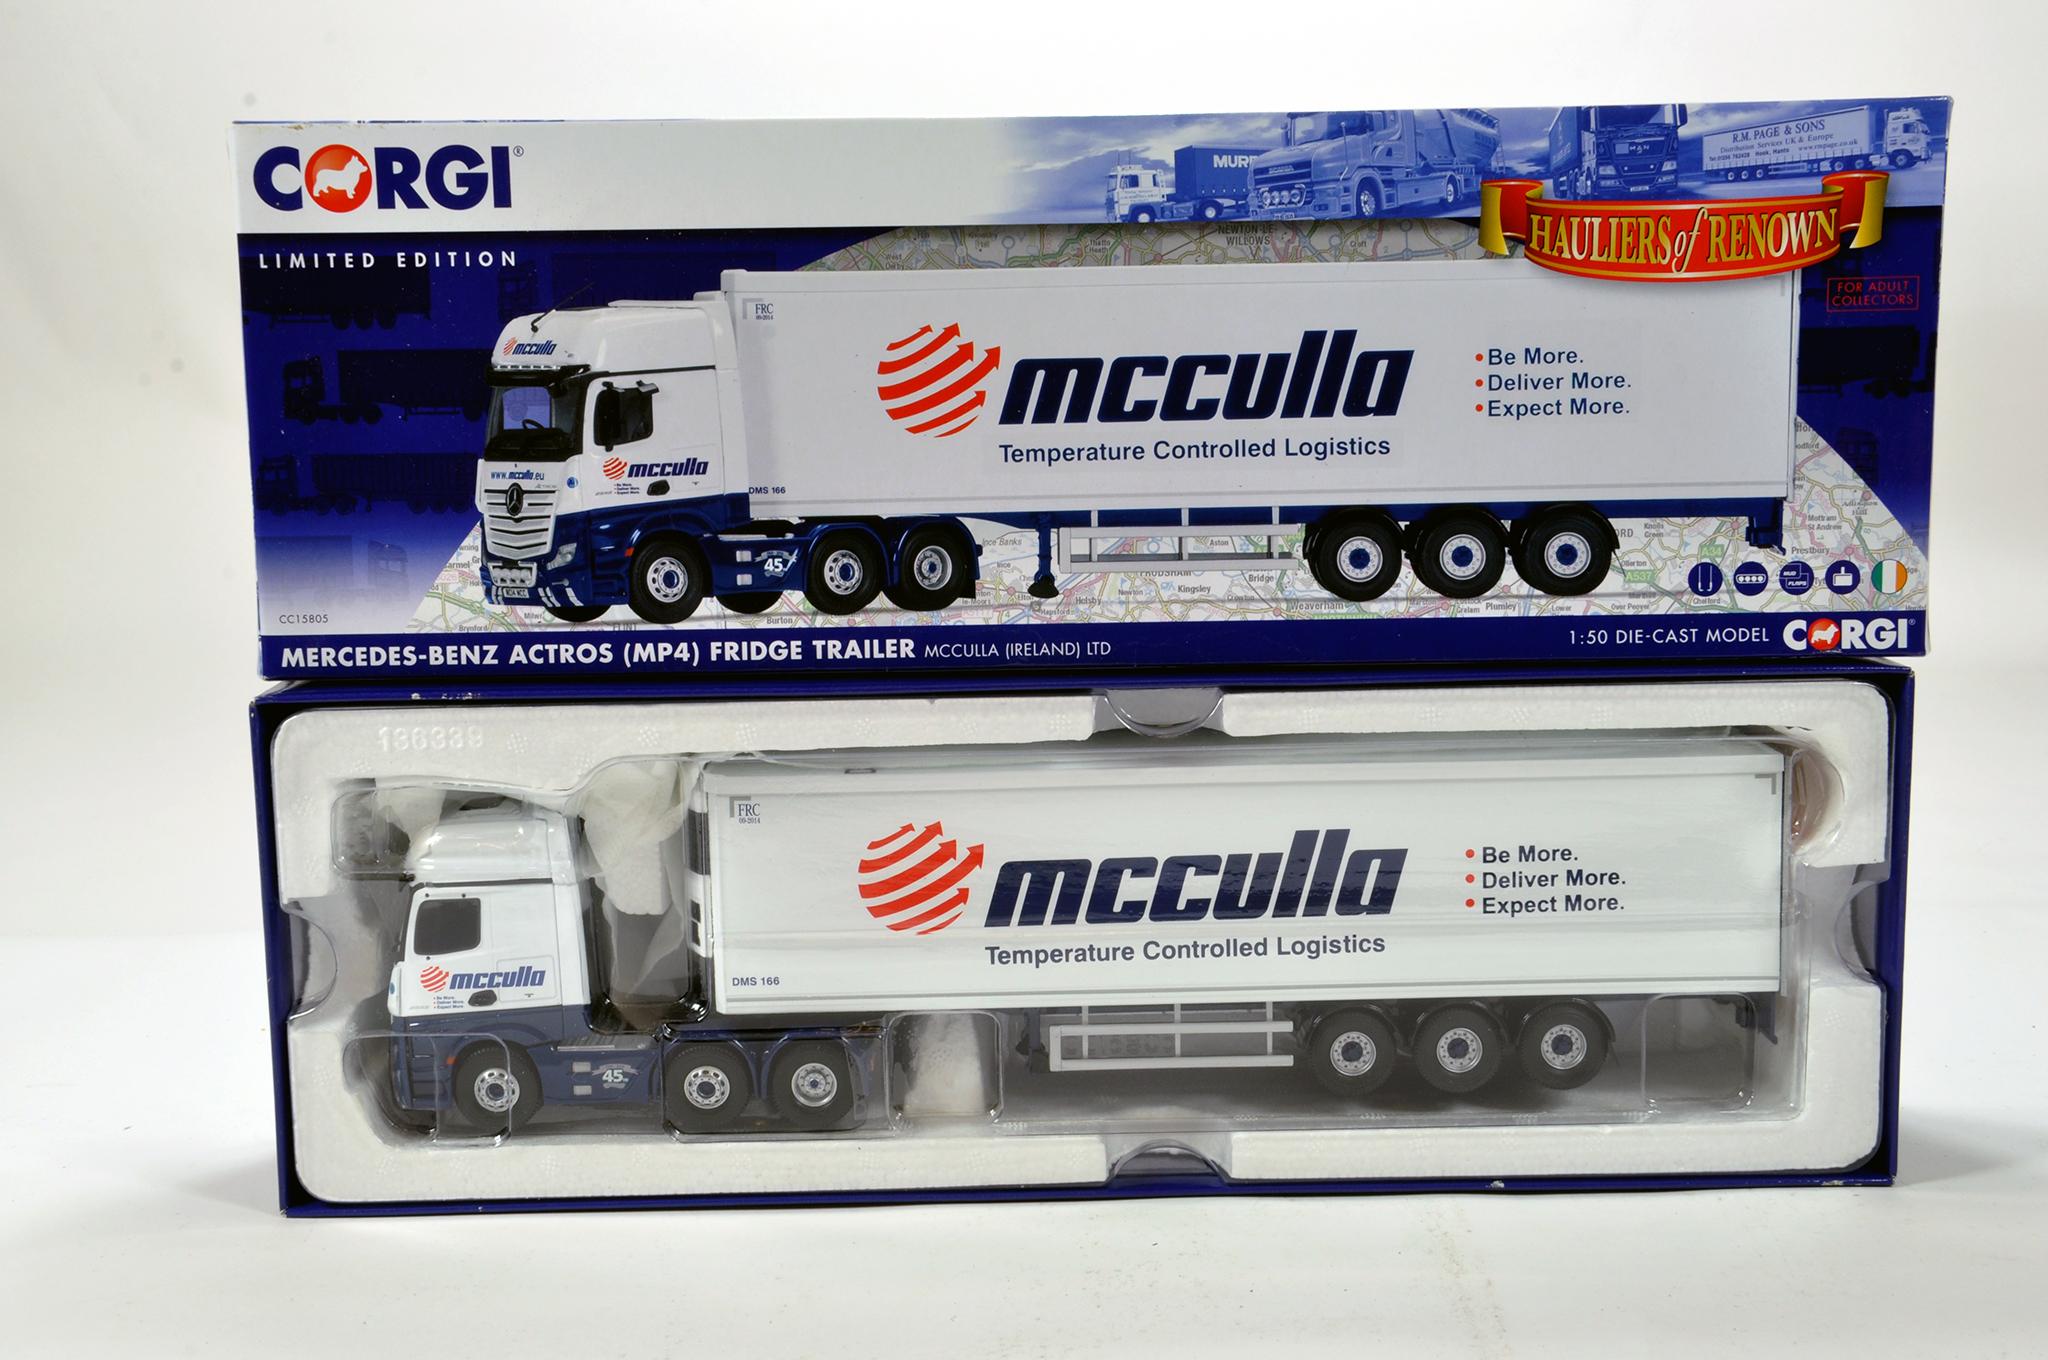 Lot 37 - Corgi 1/50 diecast truck issue comprising No. CC15805 Mercdes Benz Actros Fridge Trailer in livery